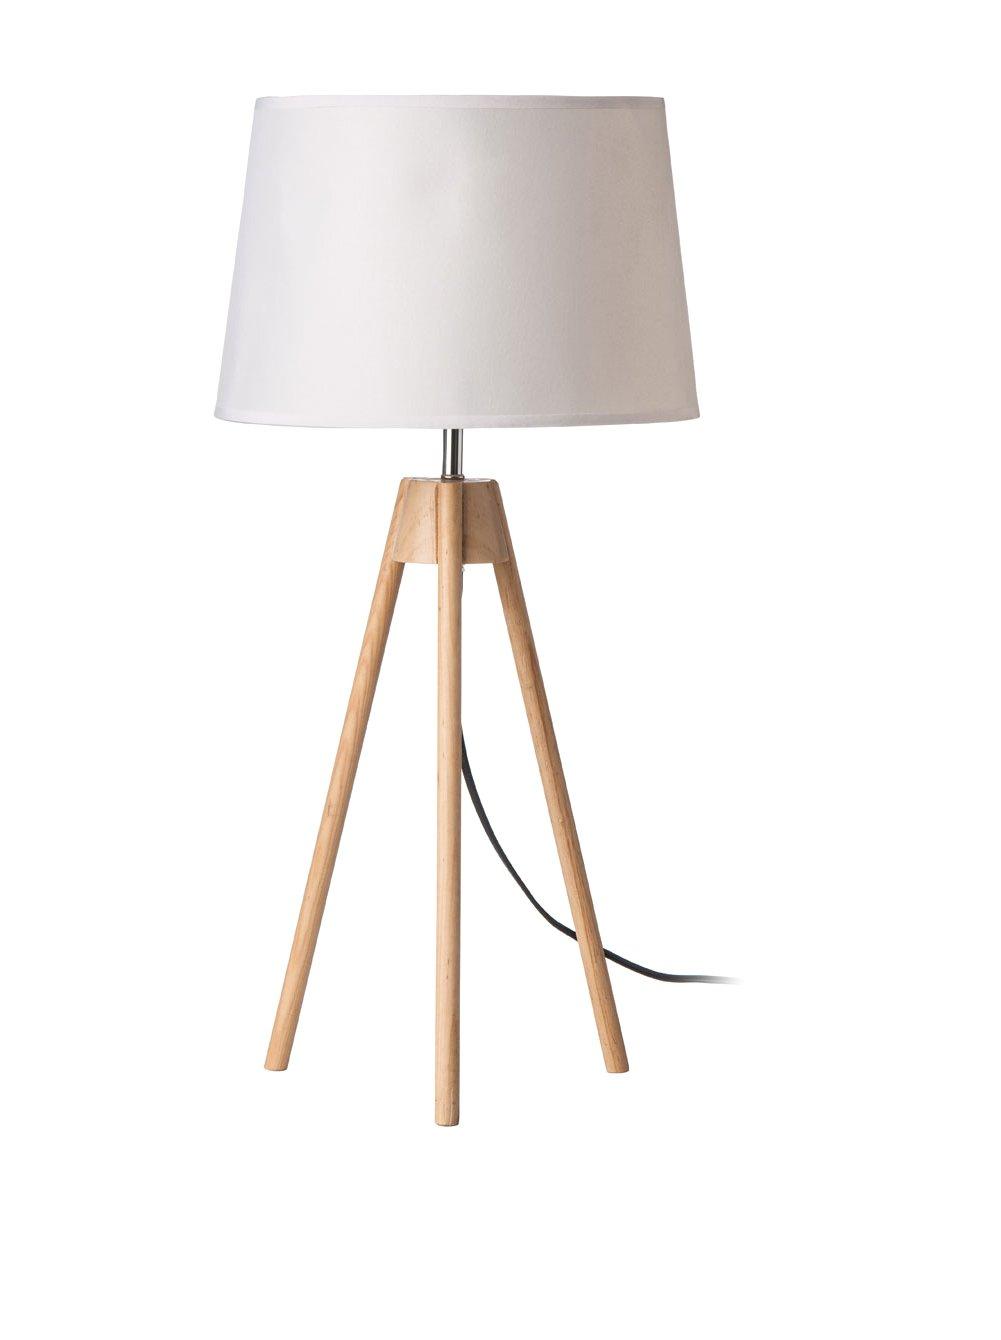 Premier Interiors Tripod Floor Lamp 1